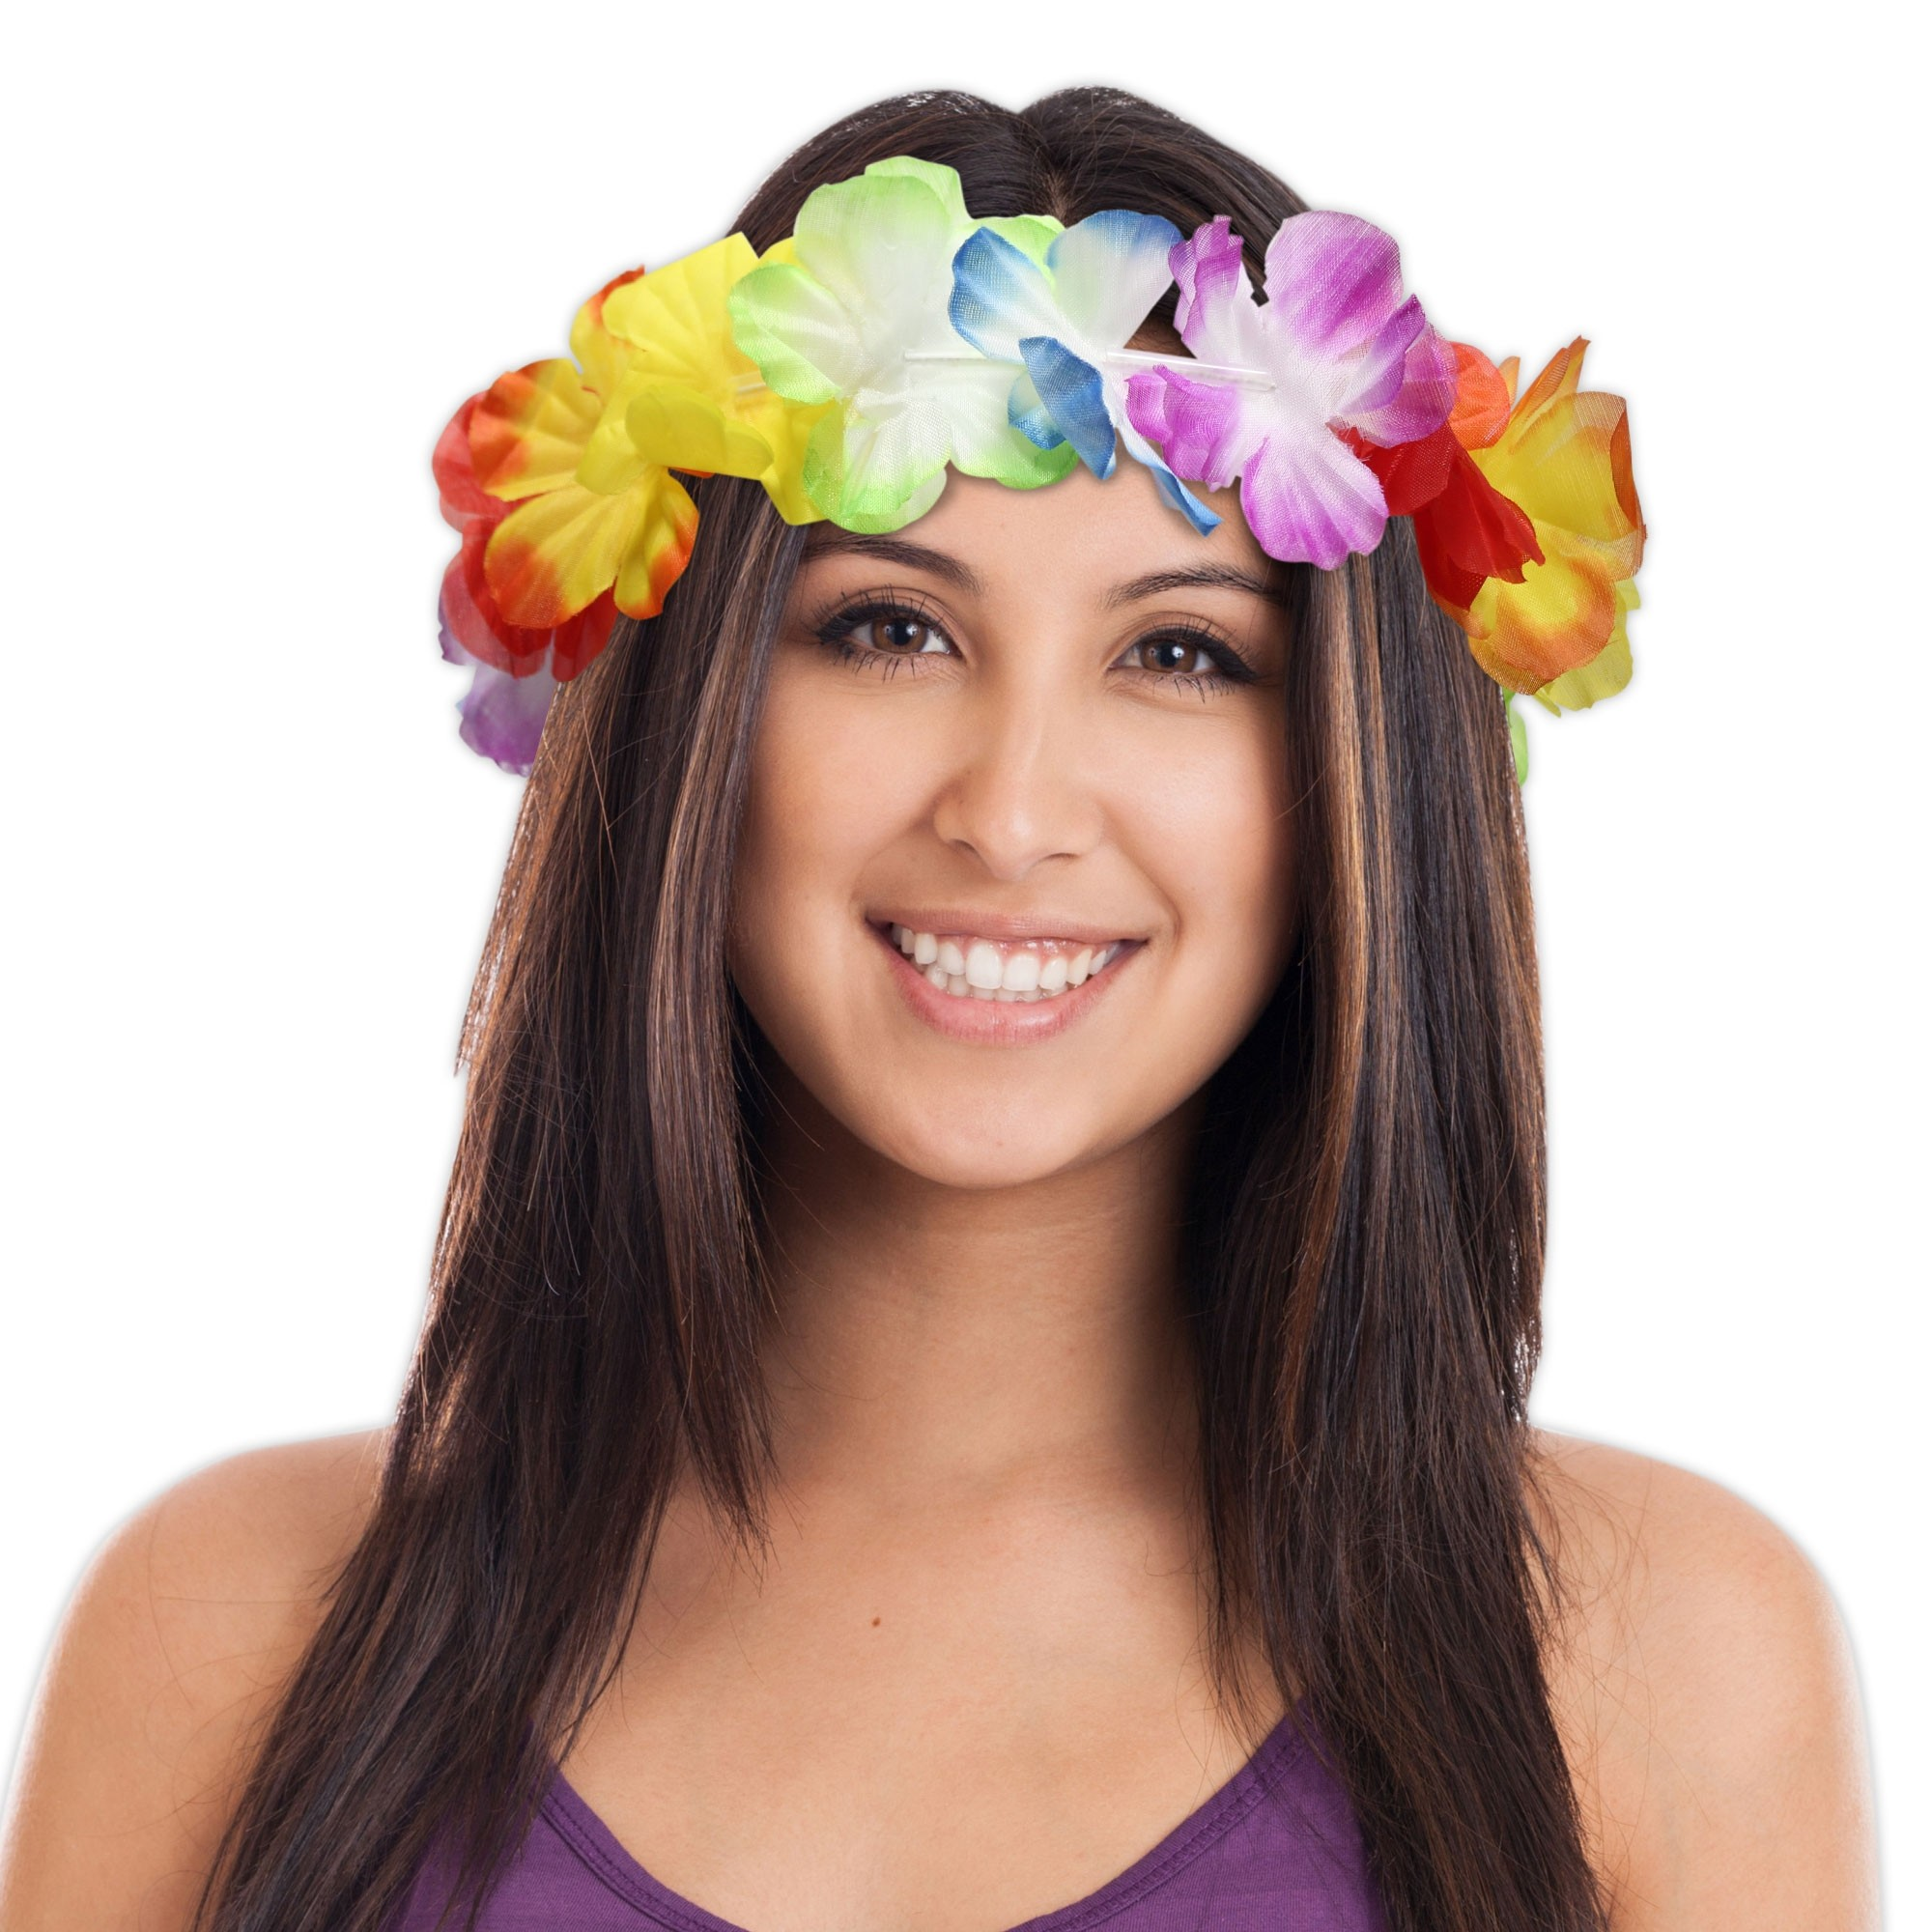 Jumbo Flower Headband - 21 inch